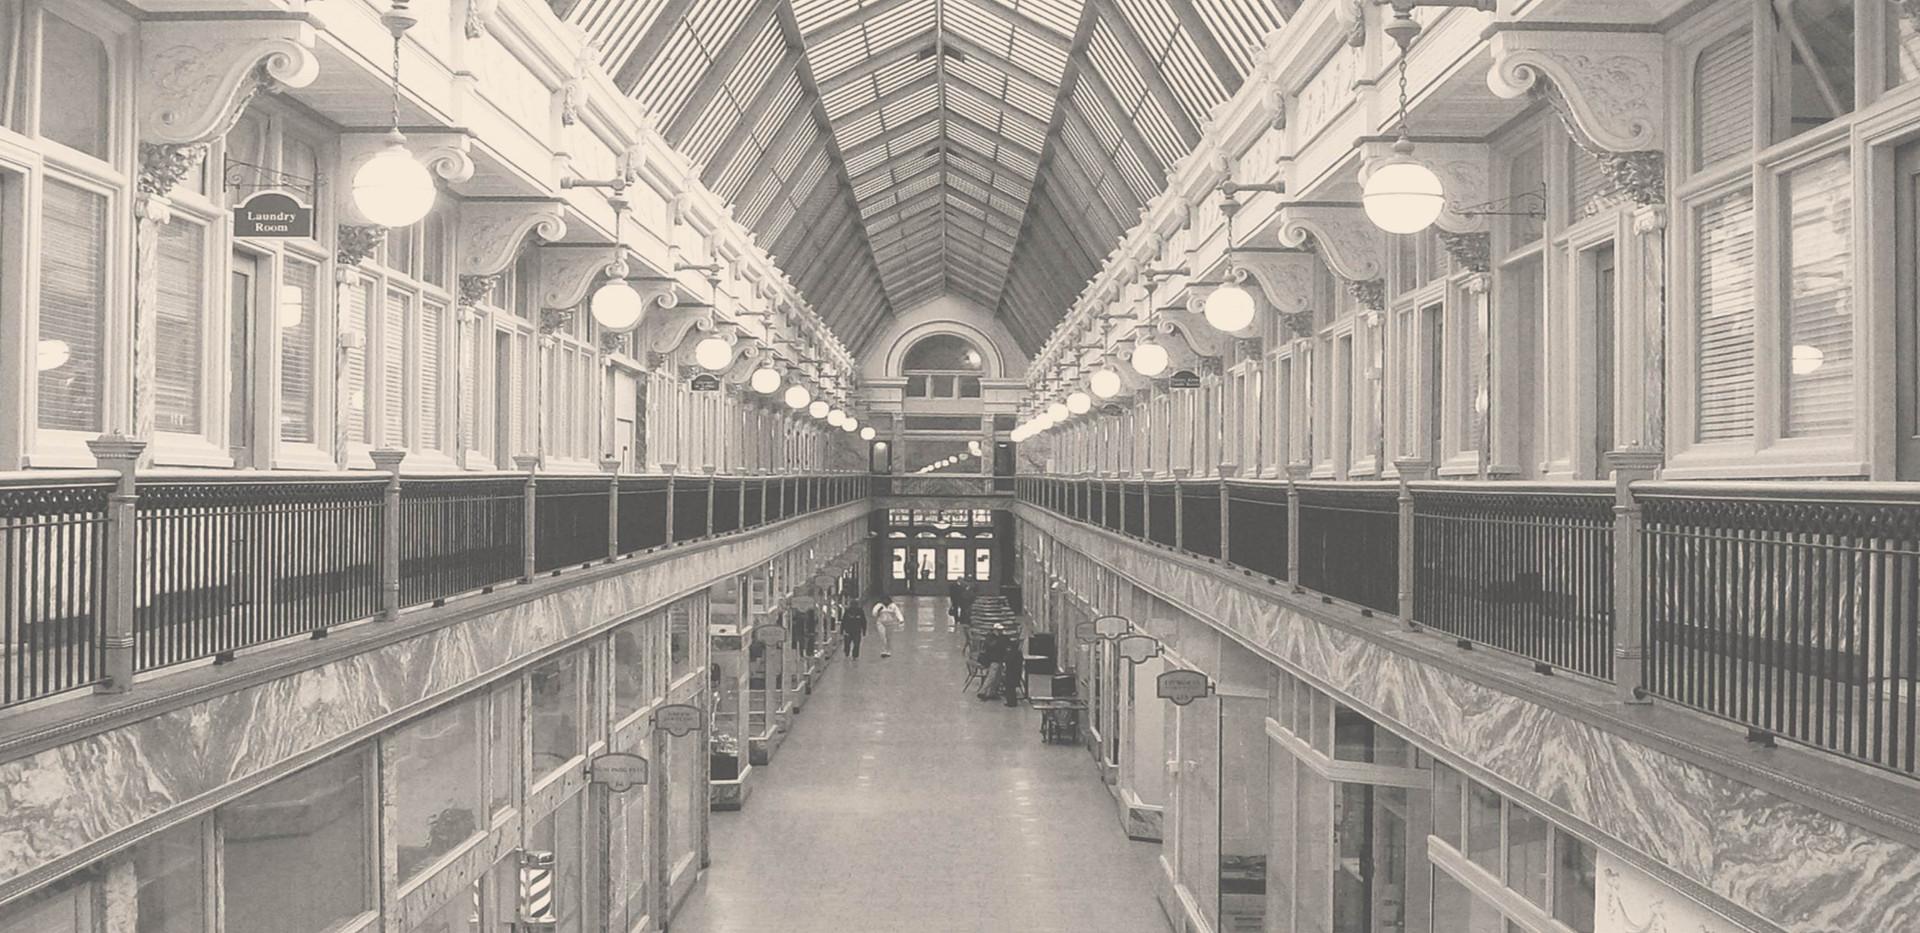 Colonial Arcade, 5th Street Arcades, Cleveland